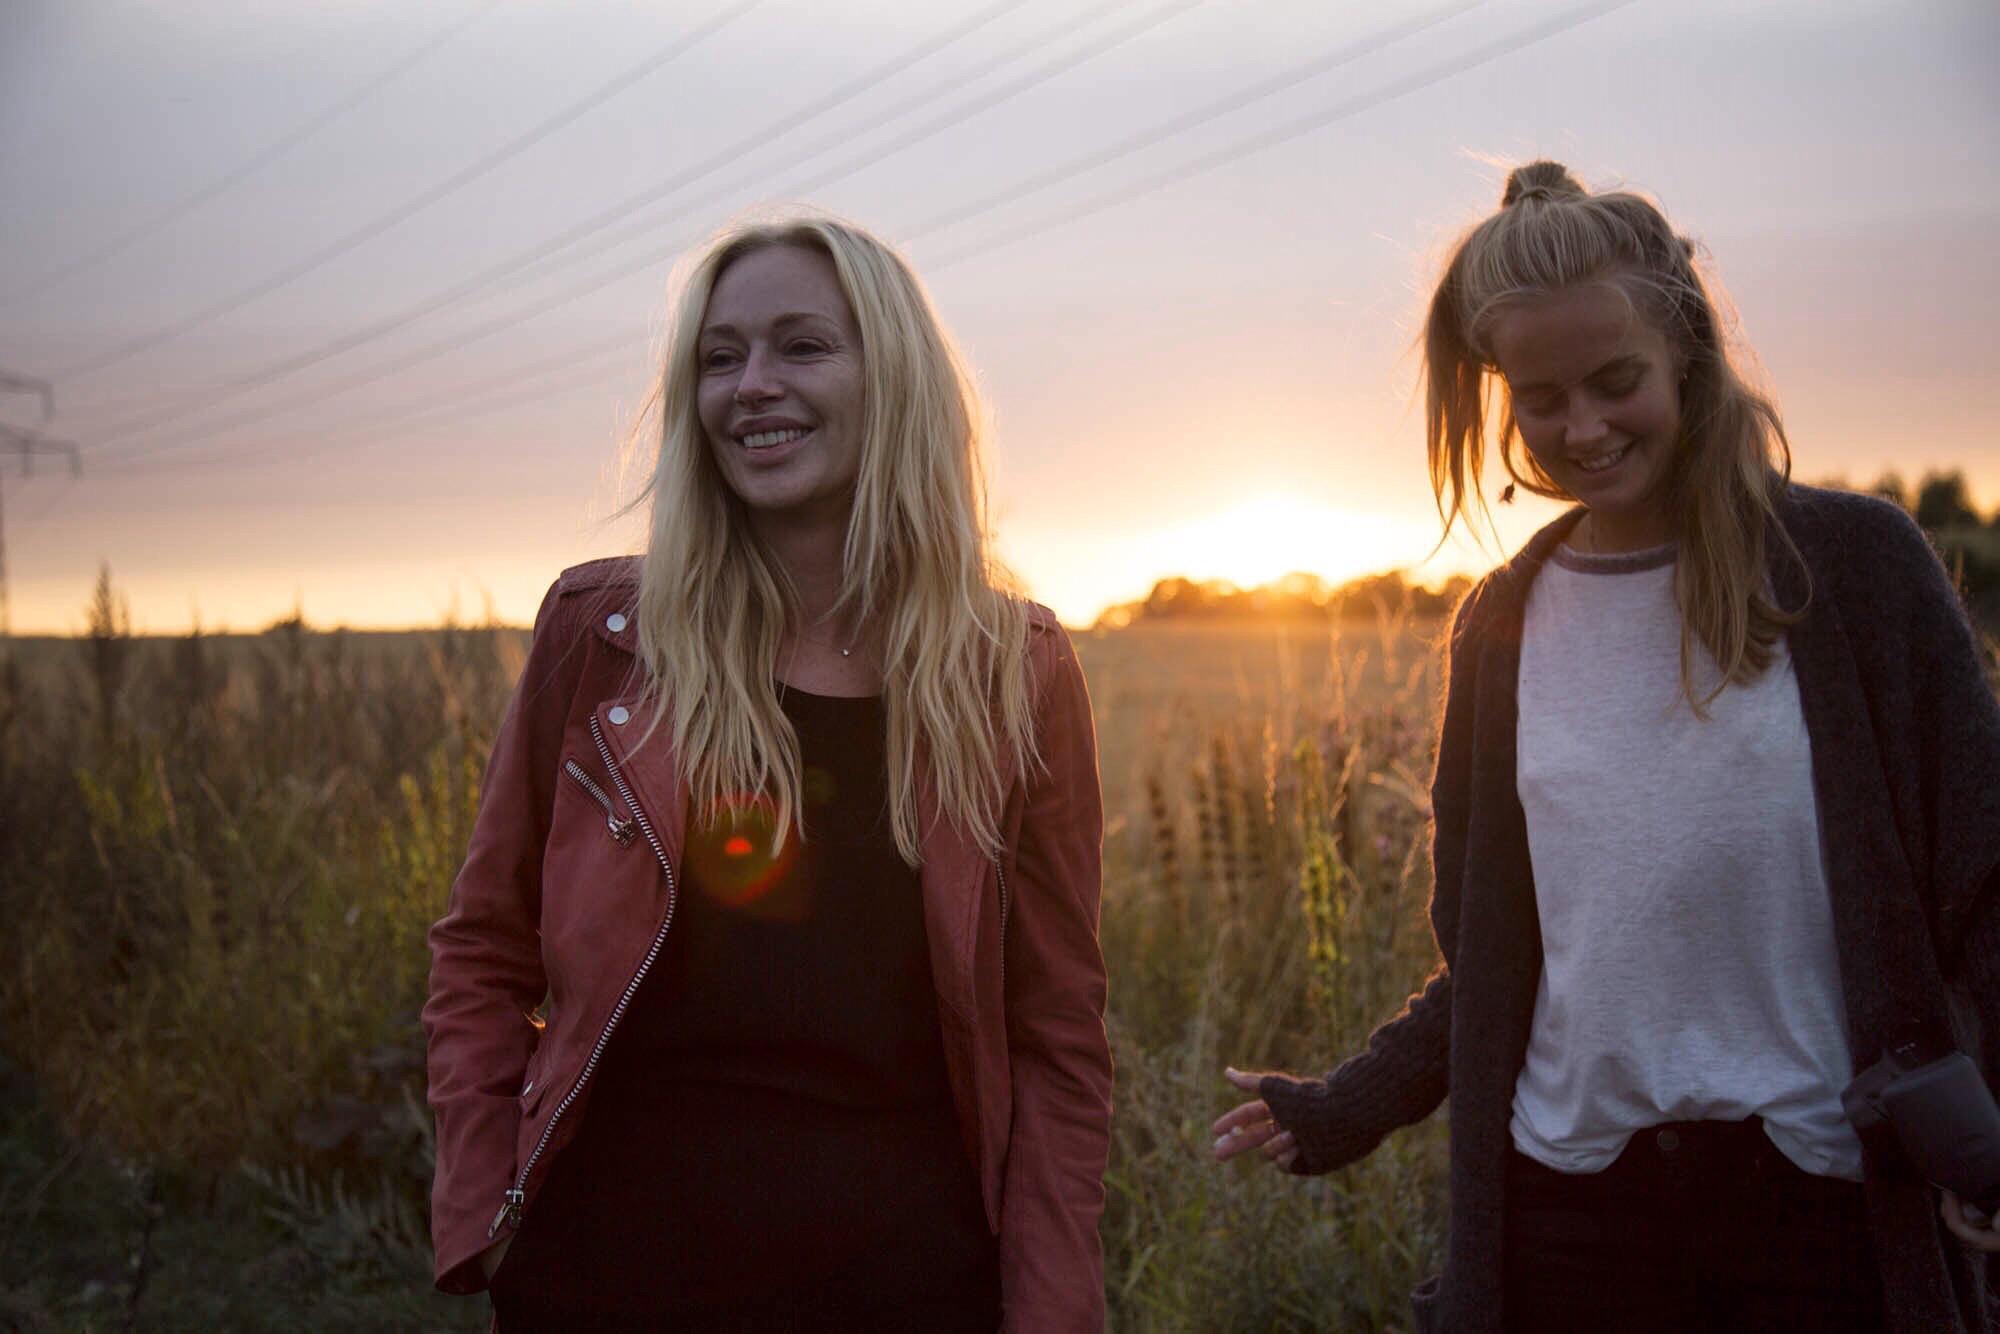 Isabel Adrian & Nathalie in Sweden summer 2015